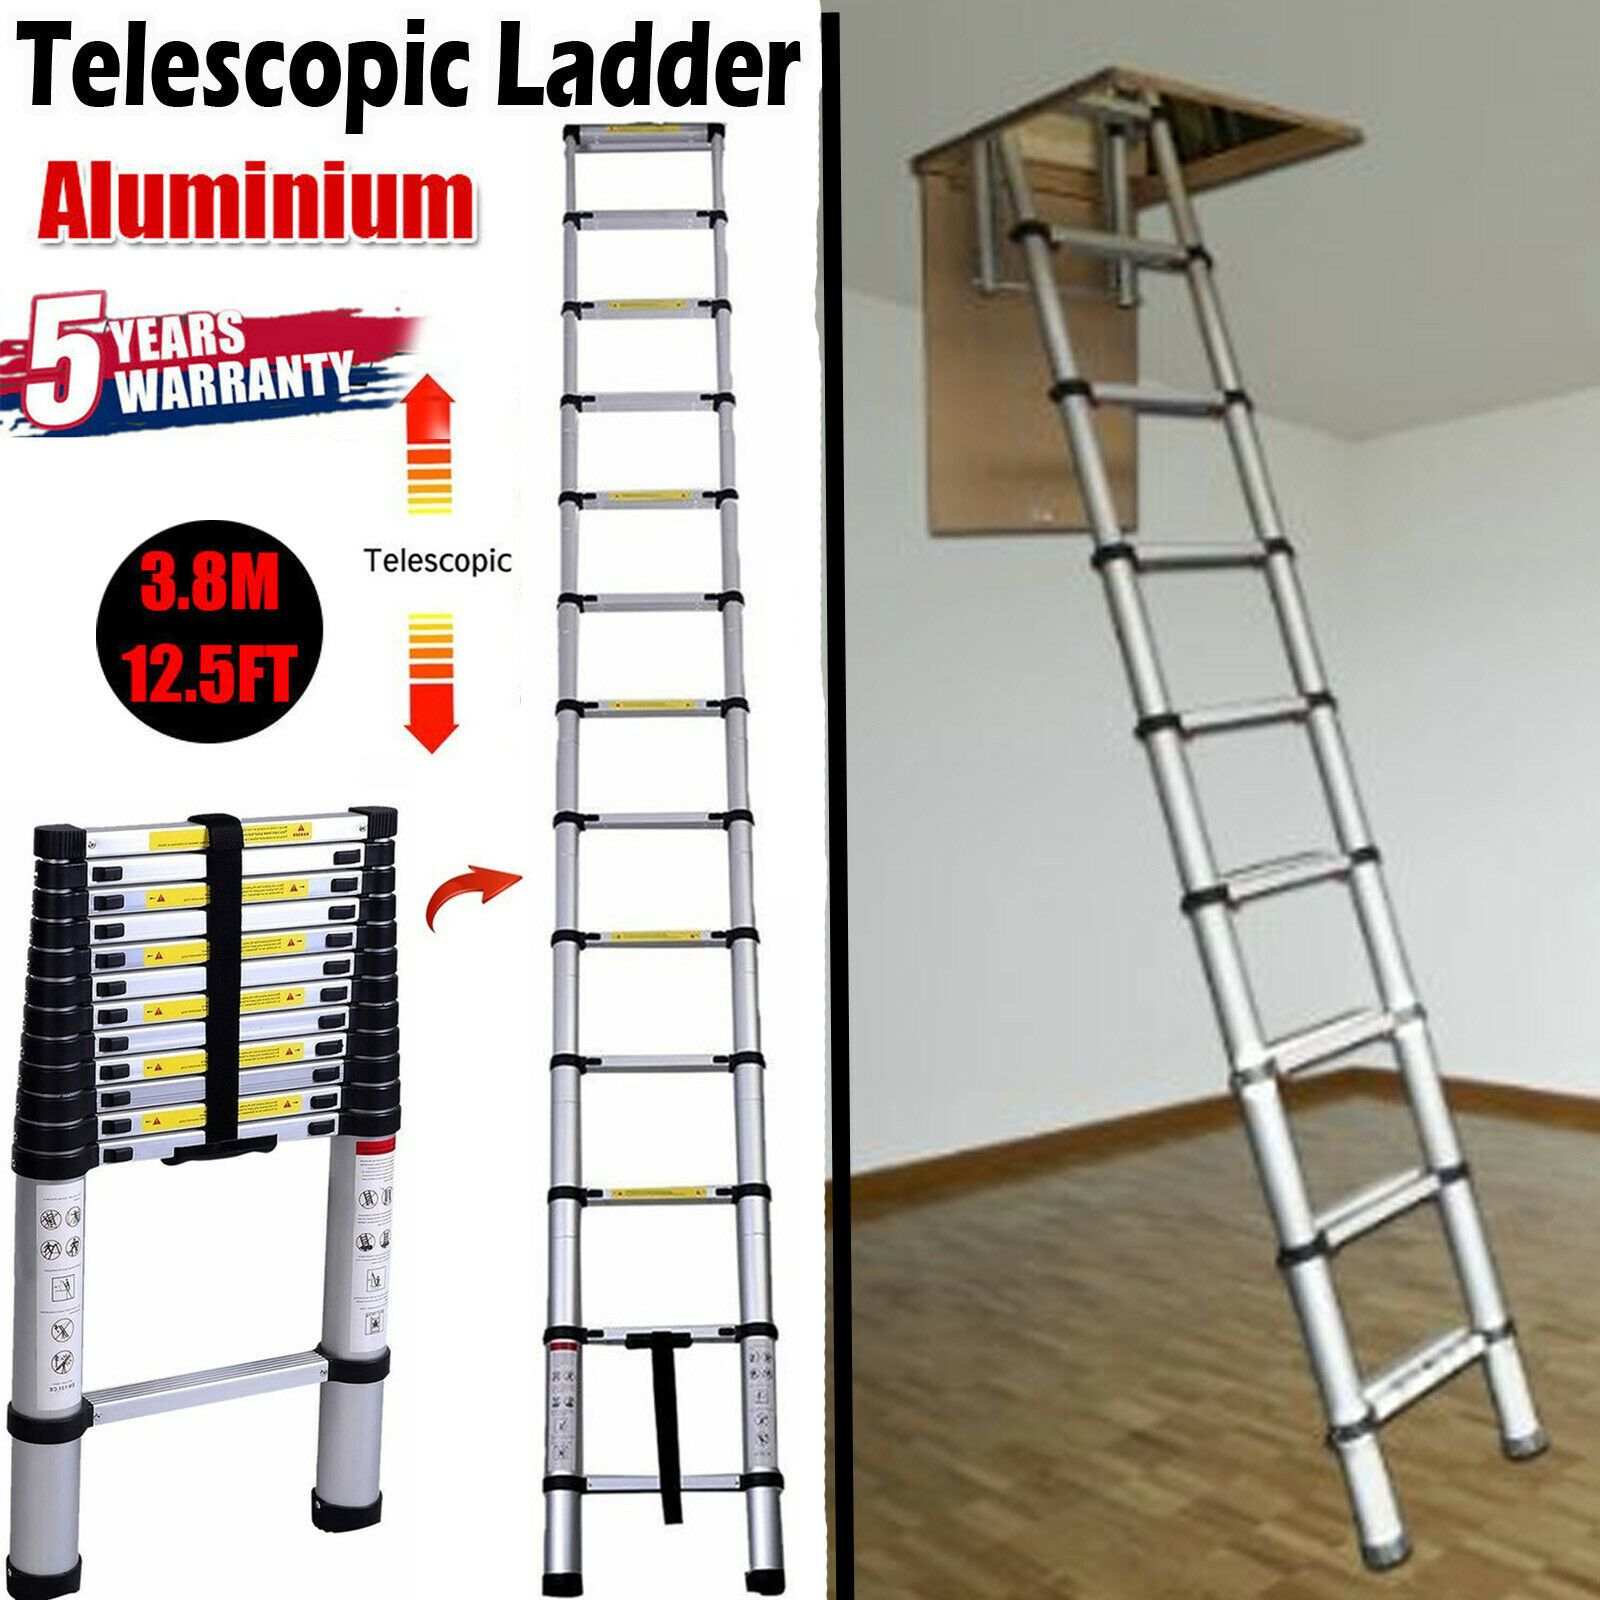 3 8m Heavyduty Aluminium Telescopic Ladder Extendable Roof Loft Attic Office Diy Ebay In 2020 Attic Ladder Telescopic Ladder Ladder